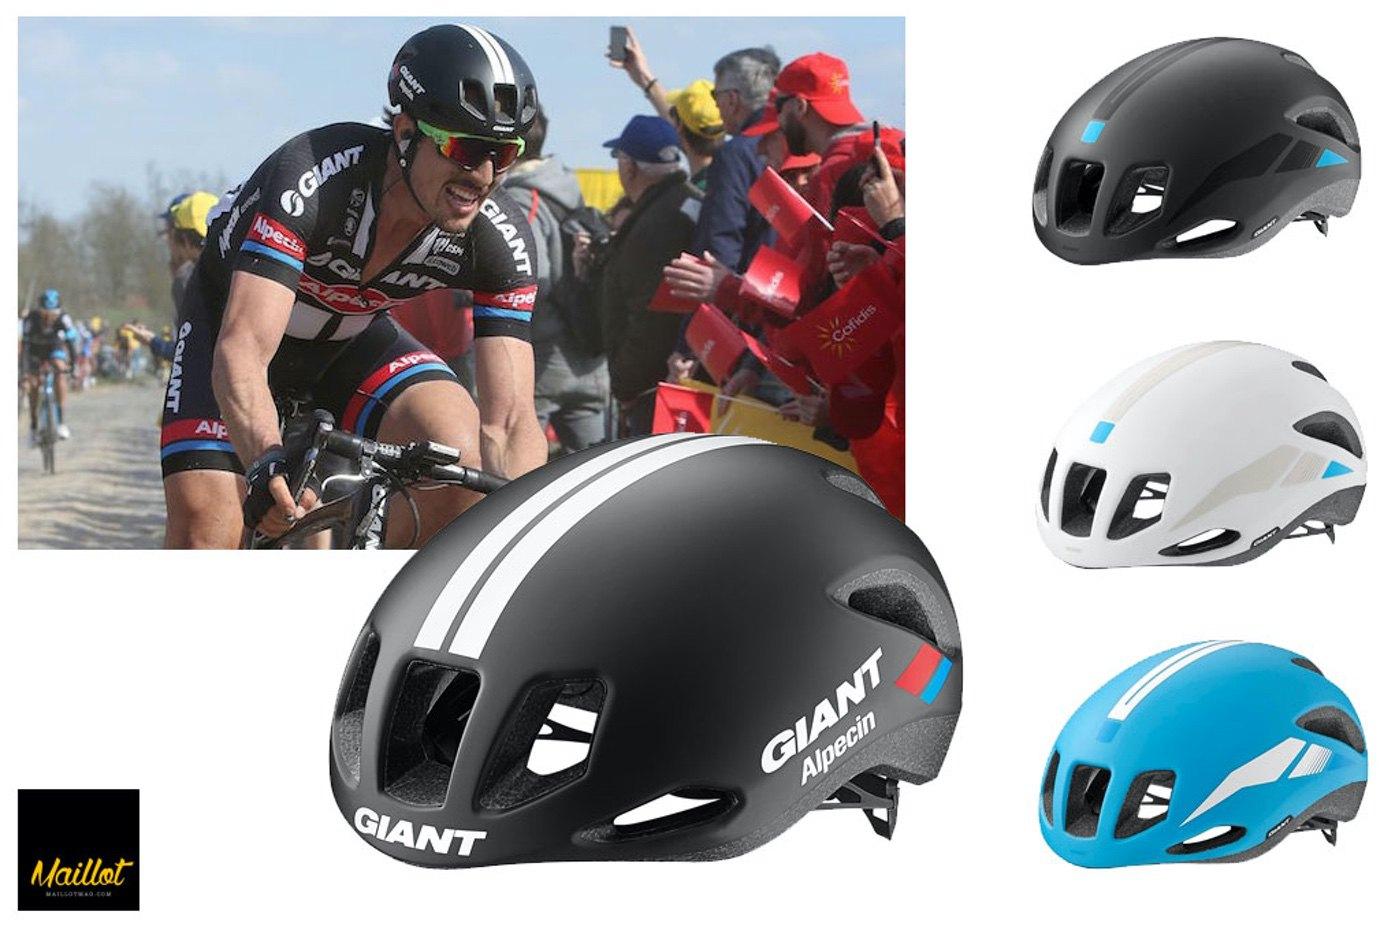 Rivet el casco aerodinámico de Giant